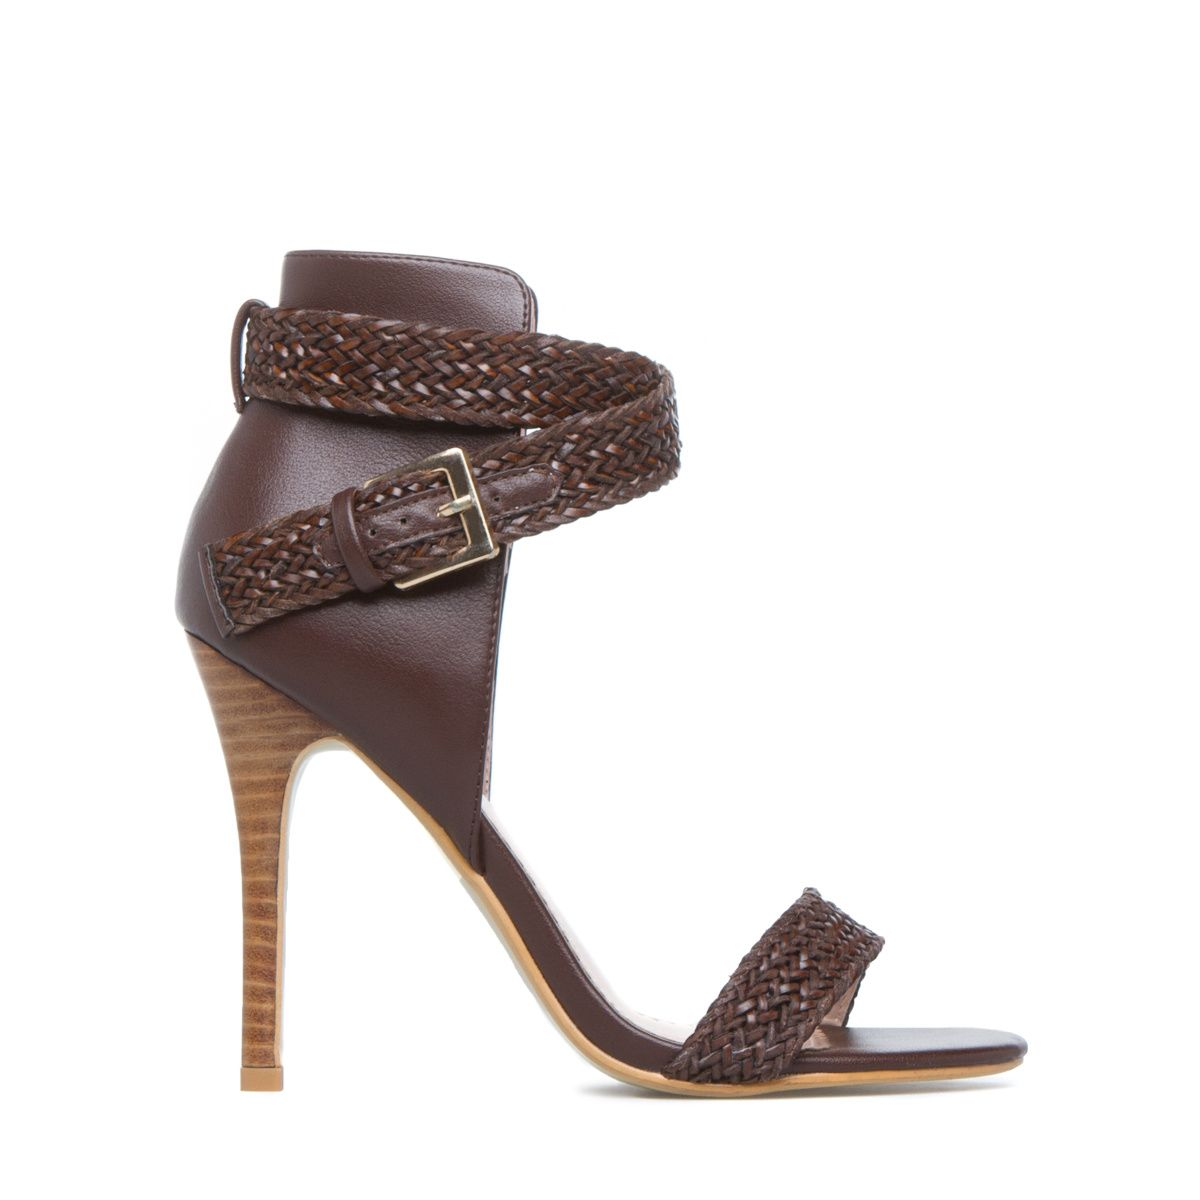 HeelsShoe ShoedazzleLoveCheap Lovett ShoedazzleLoveCheap HeelsShoe ShoedazzleLoveCheap Lovett Lovett ShoedazzleLoveCheap Lovett HeelsShoe Dazzle Dazzle Dazzle mn8Nwv0O